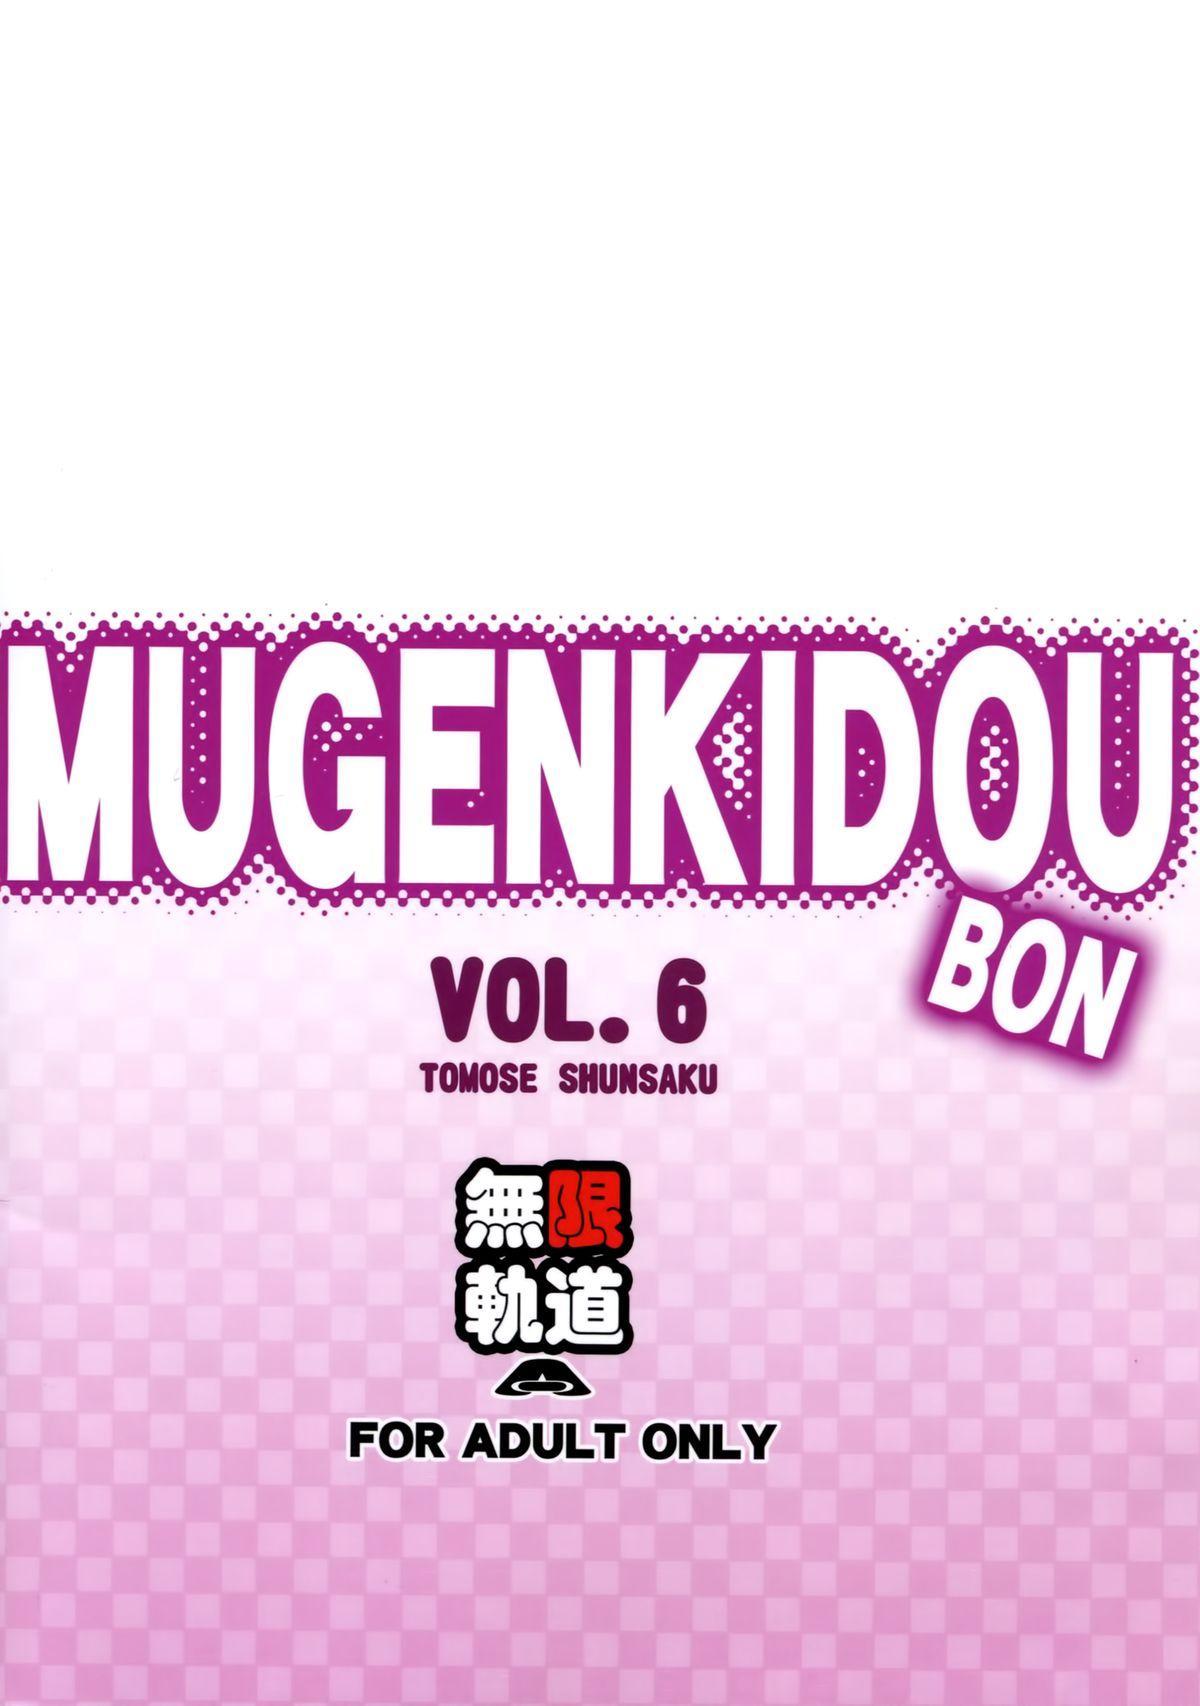 MUGENKIDOUBON! Vol. 6 14